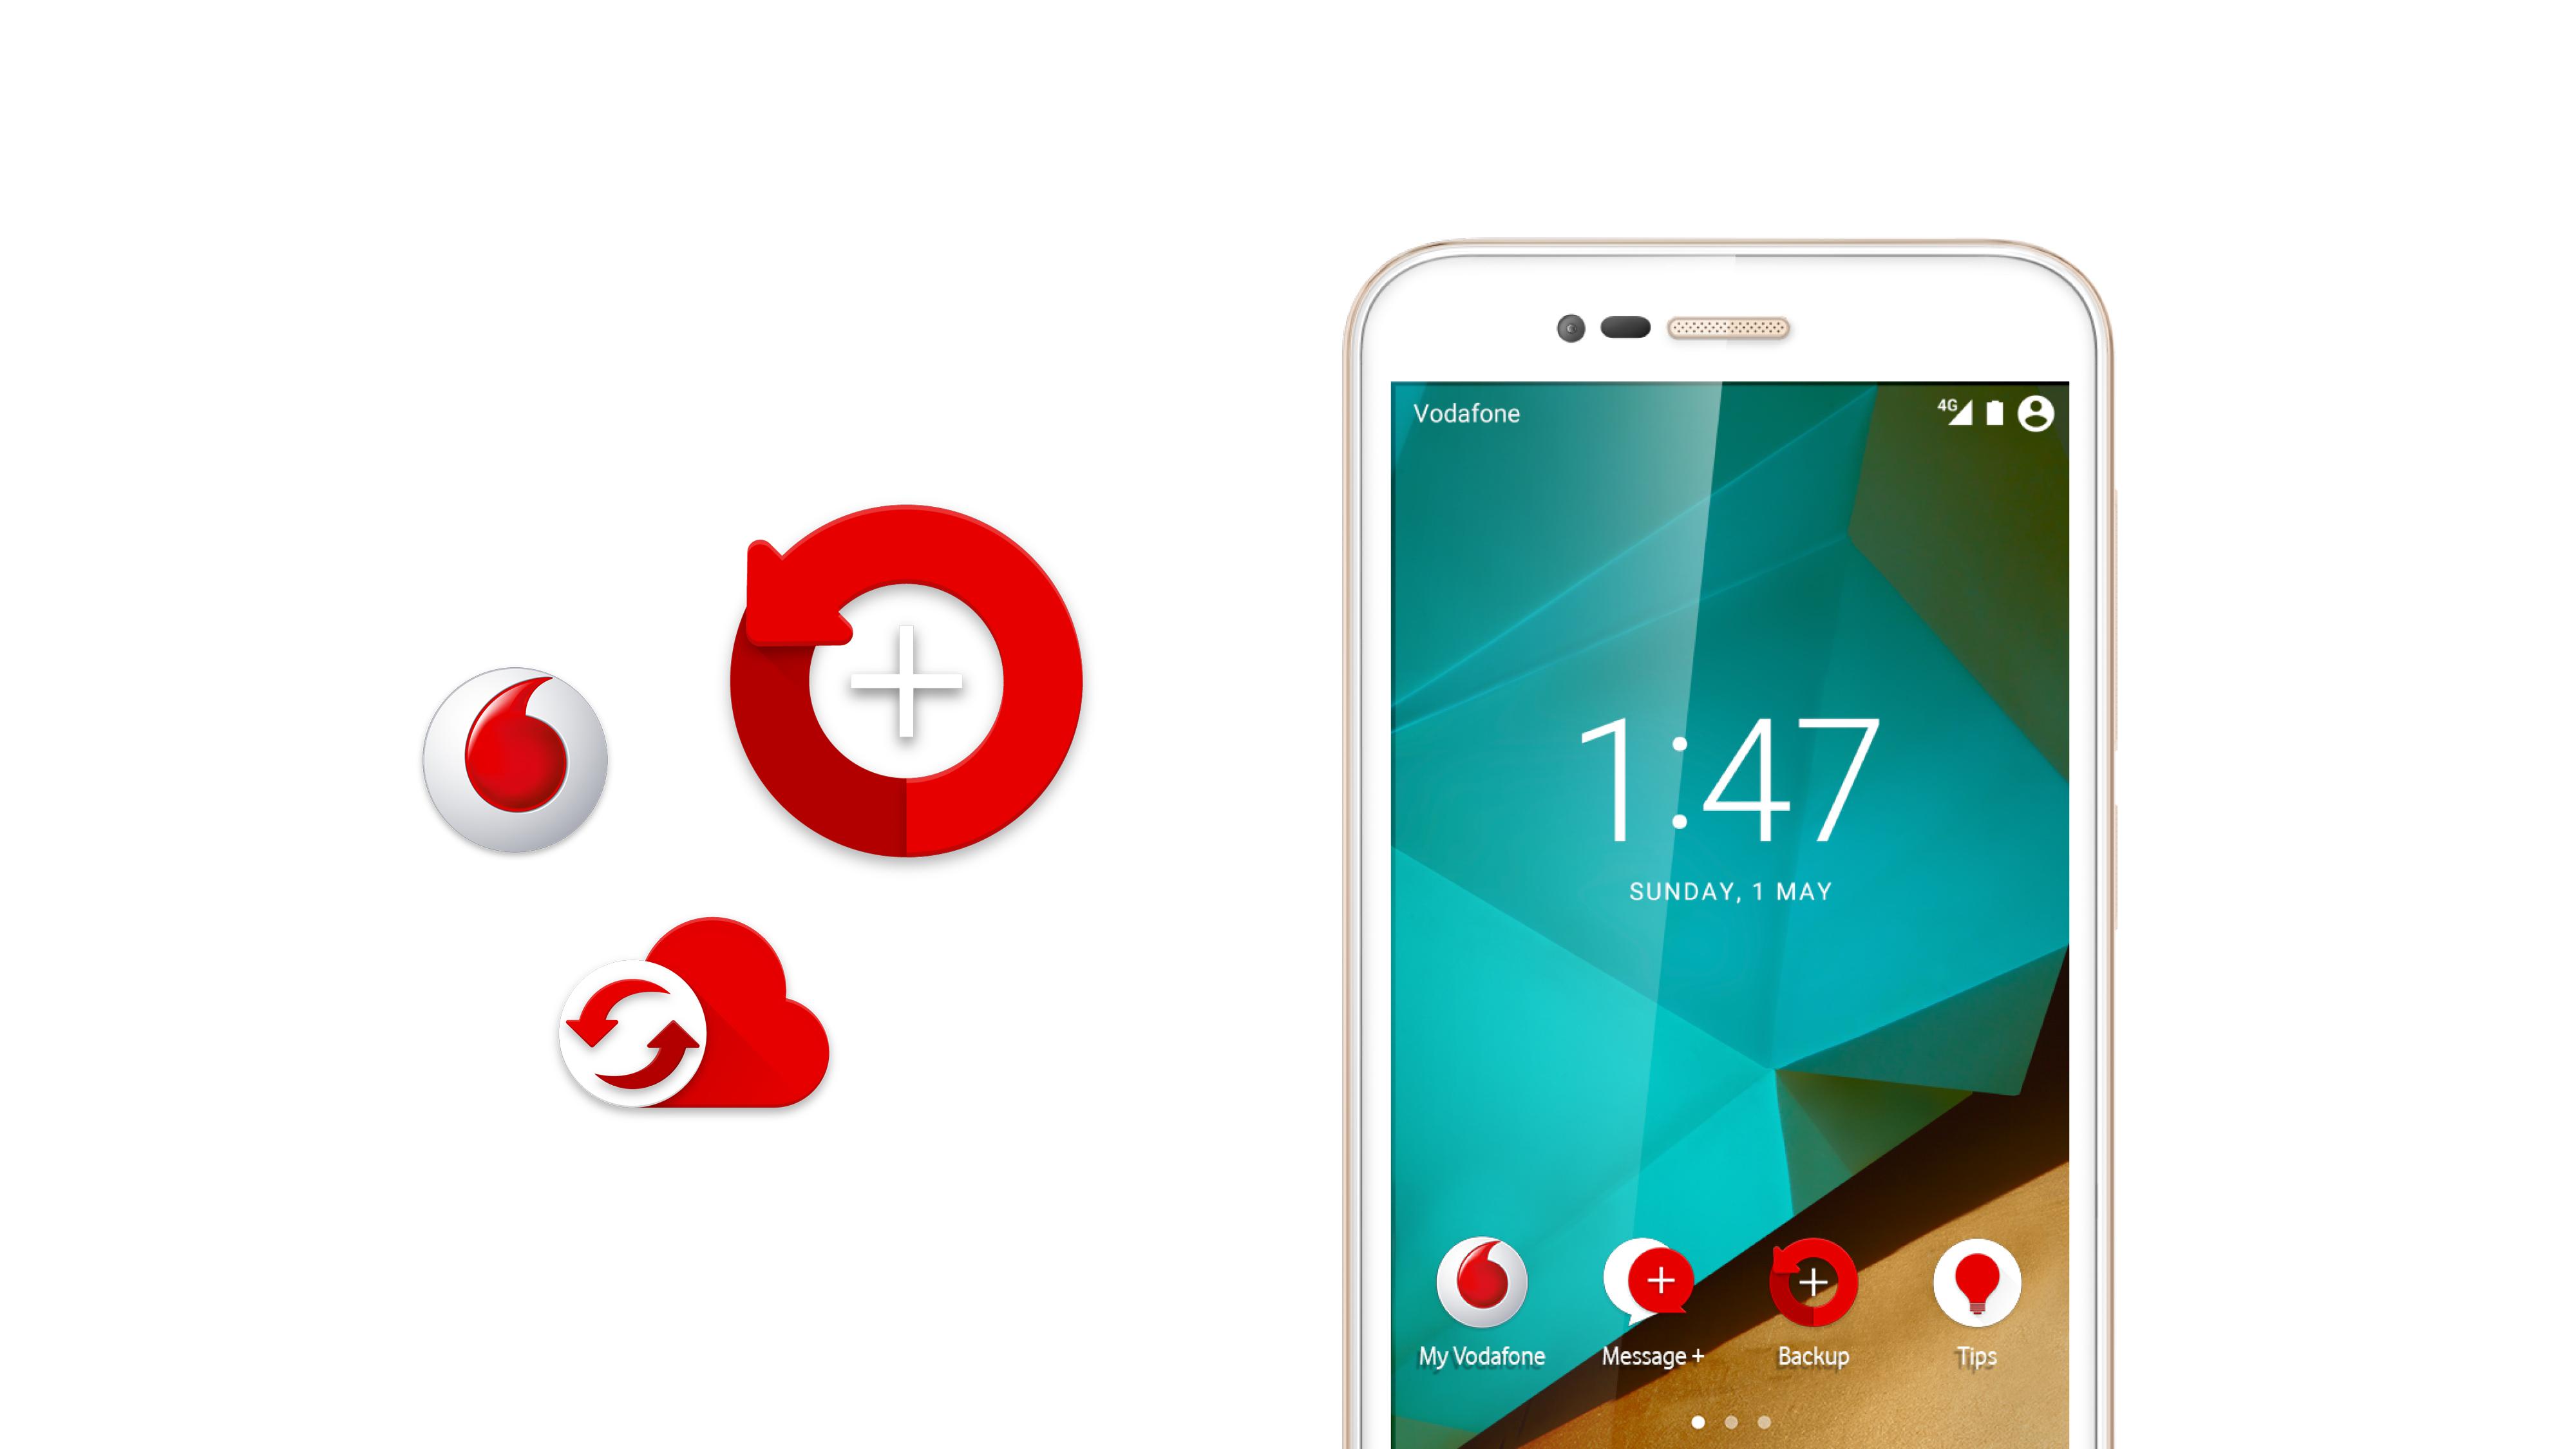 Vodafone Iconography